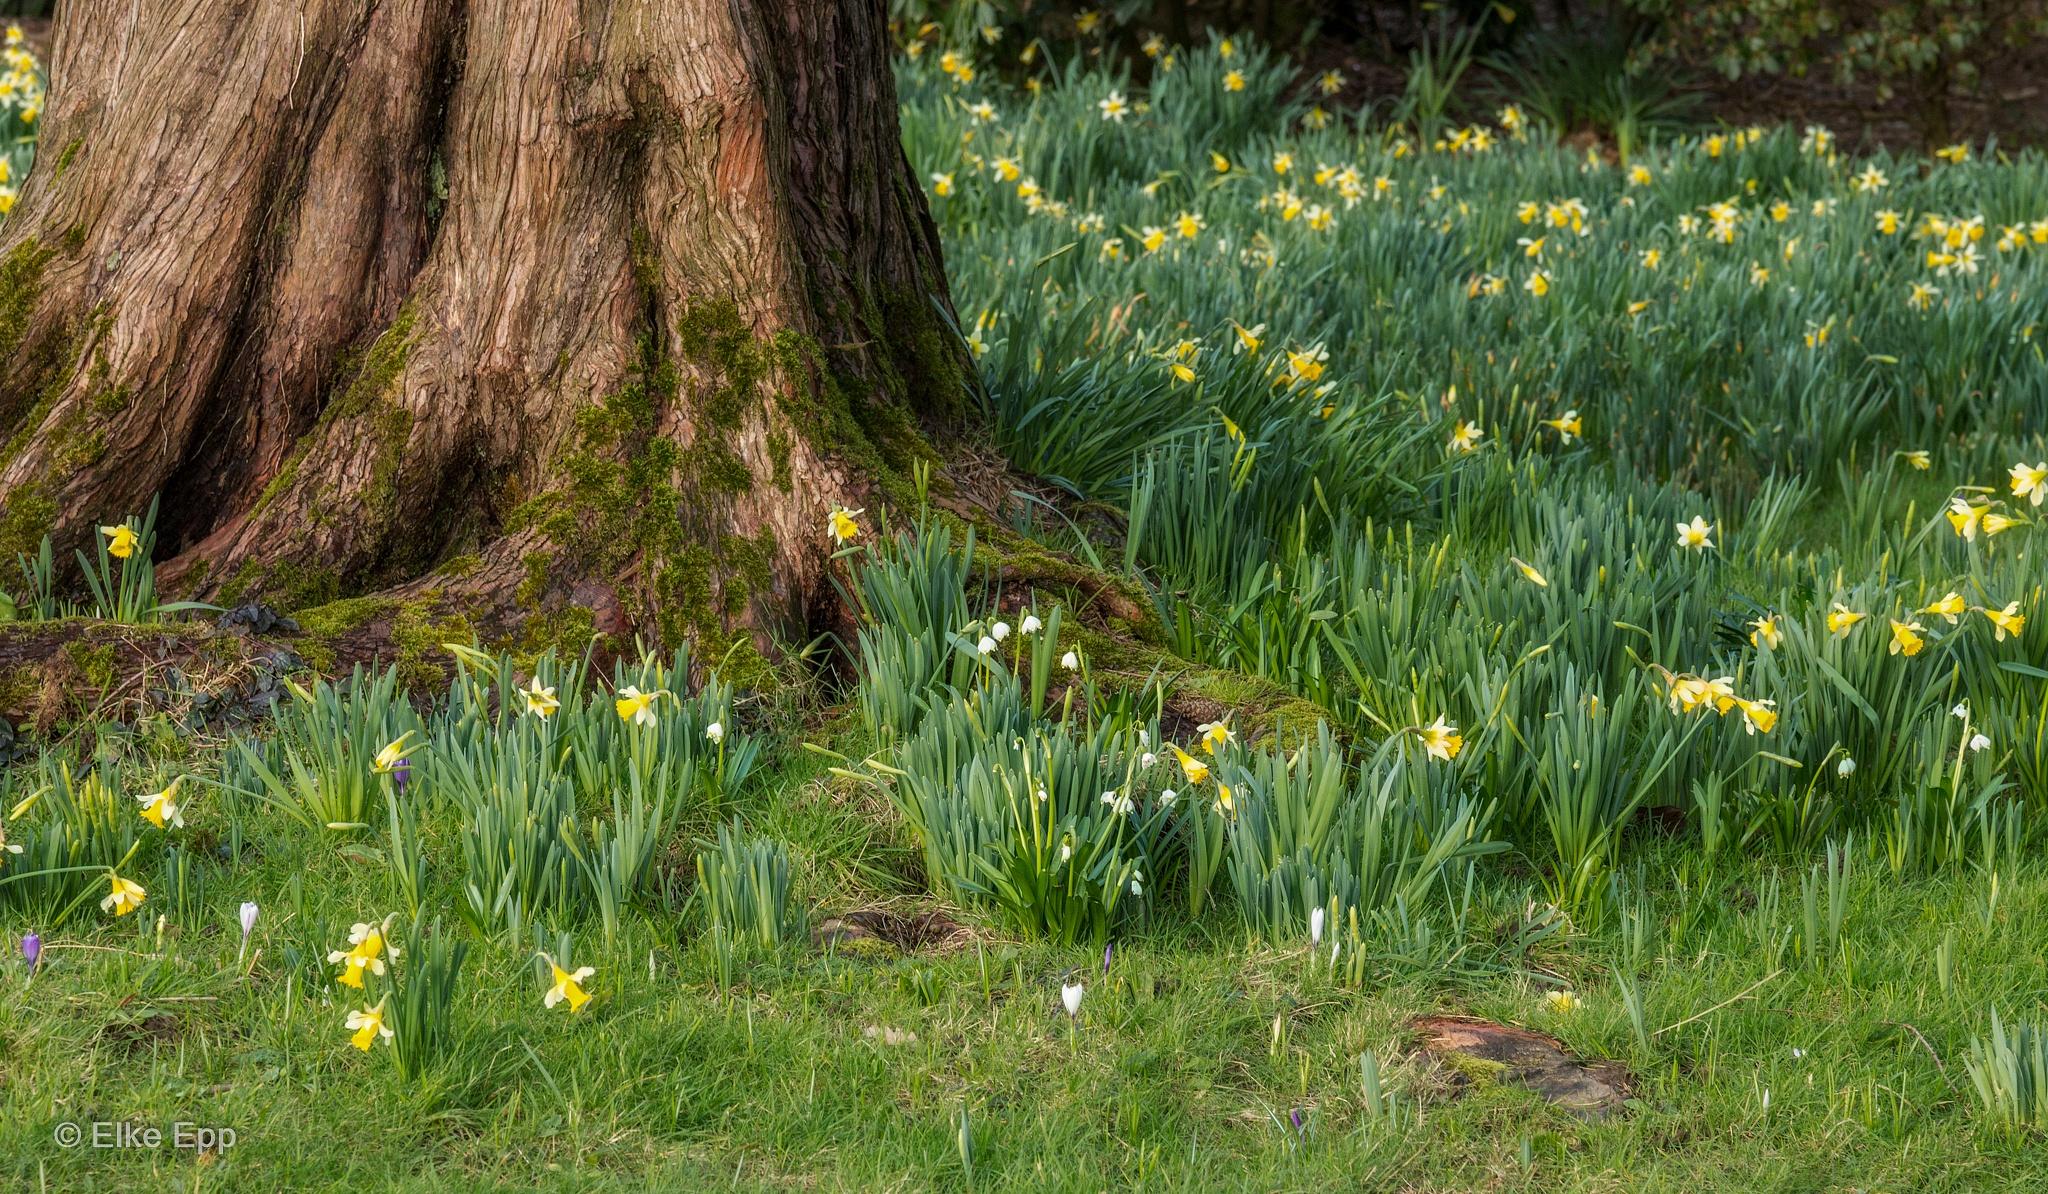 Daffodils at Nymans Garden by elkeepp